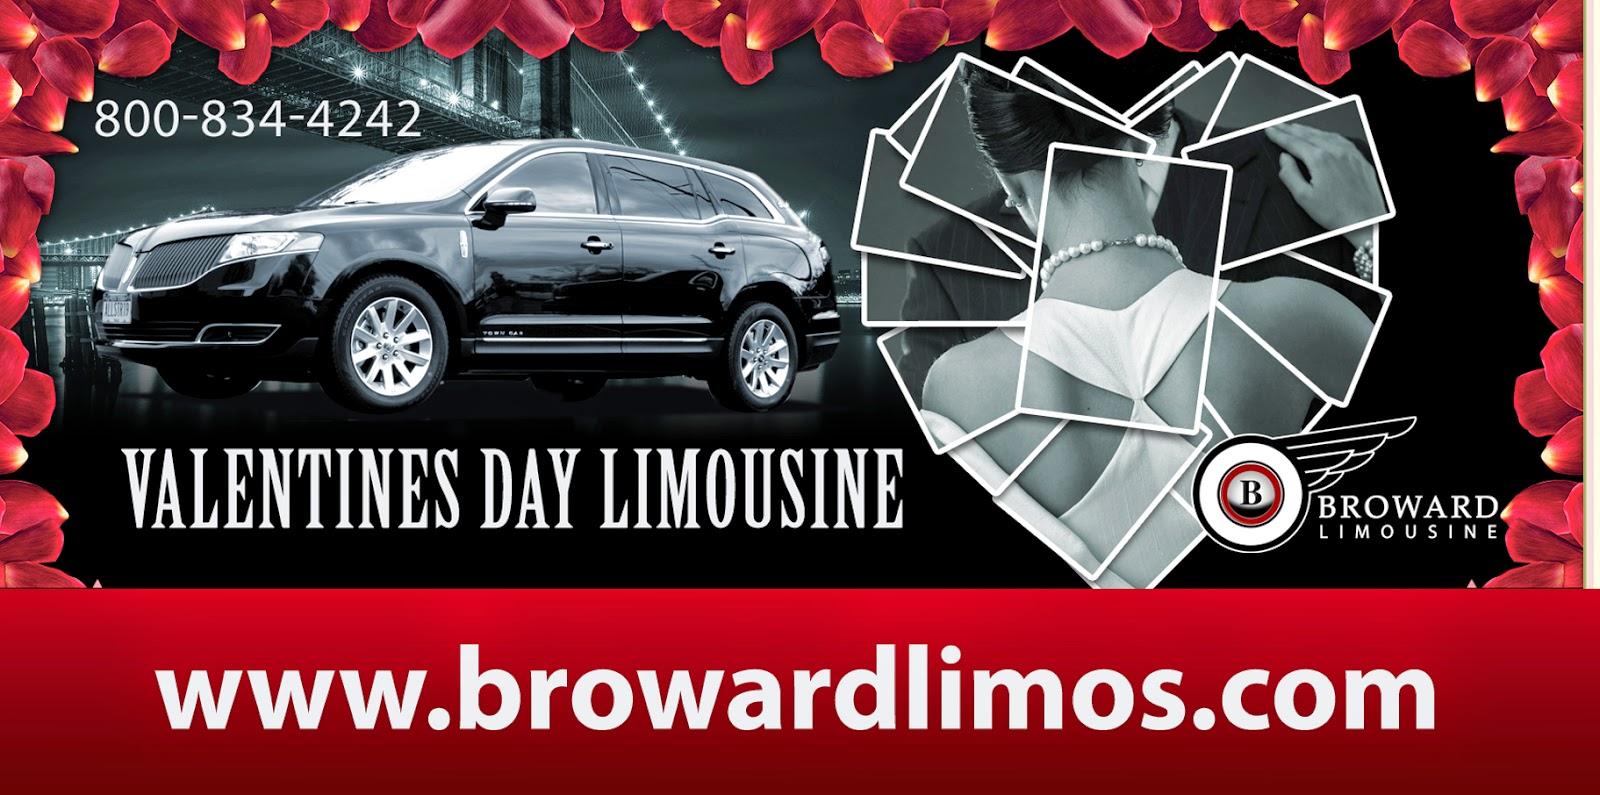 Valentines Day Limousine